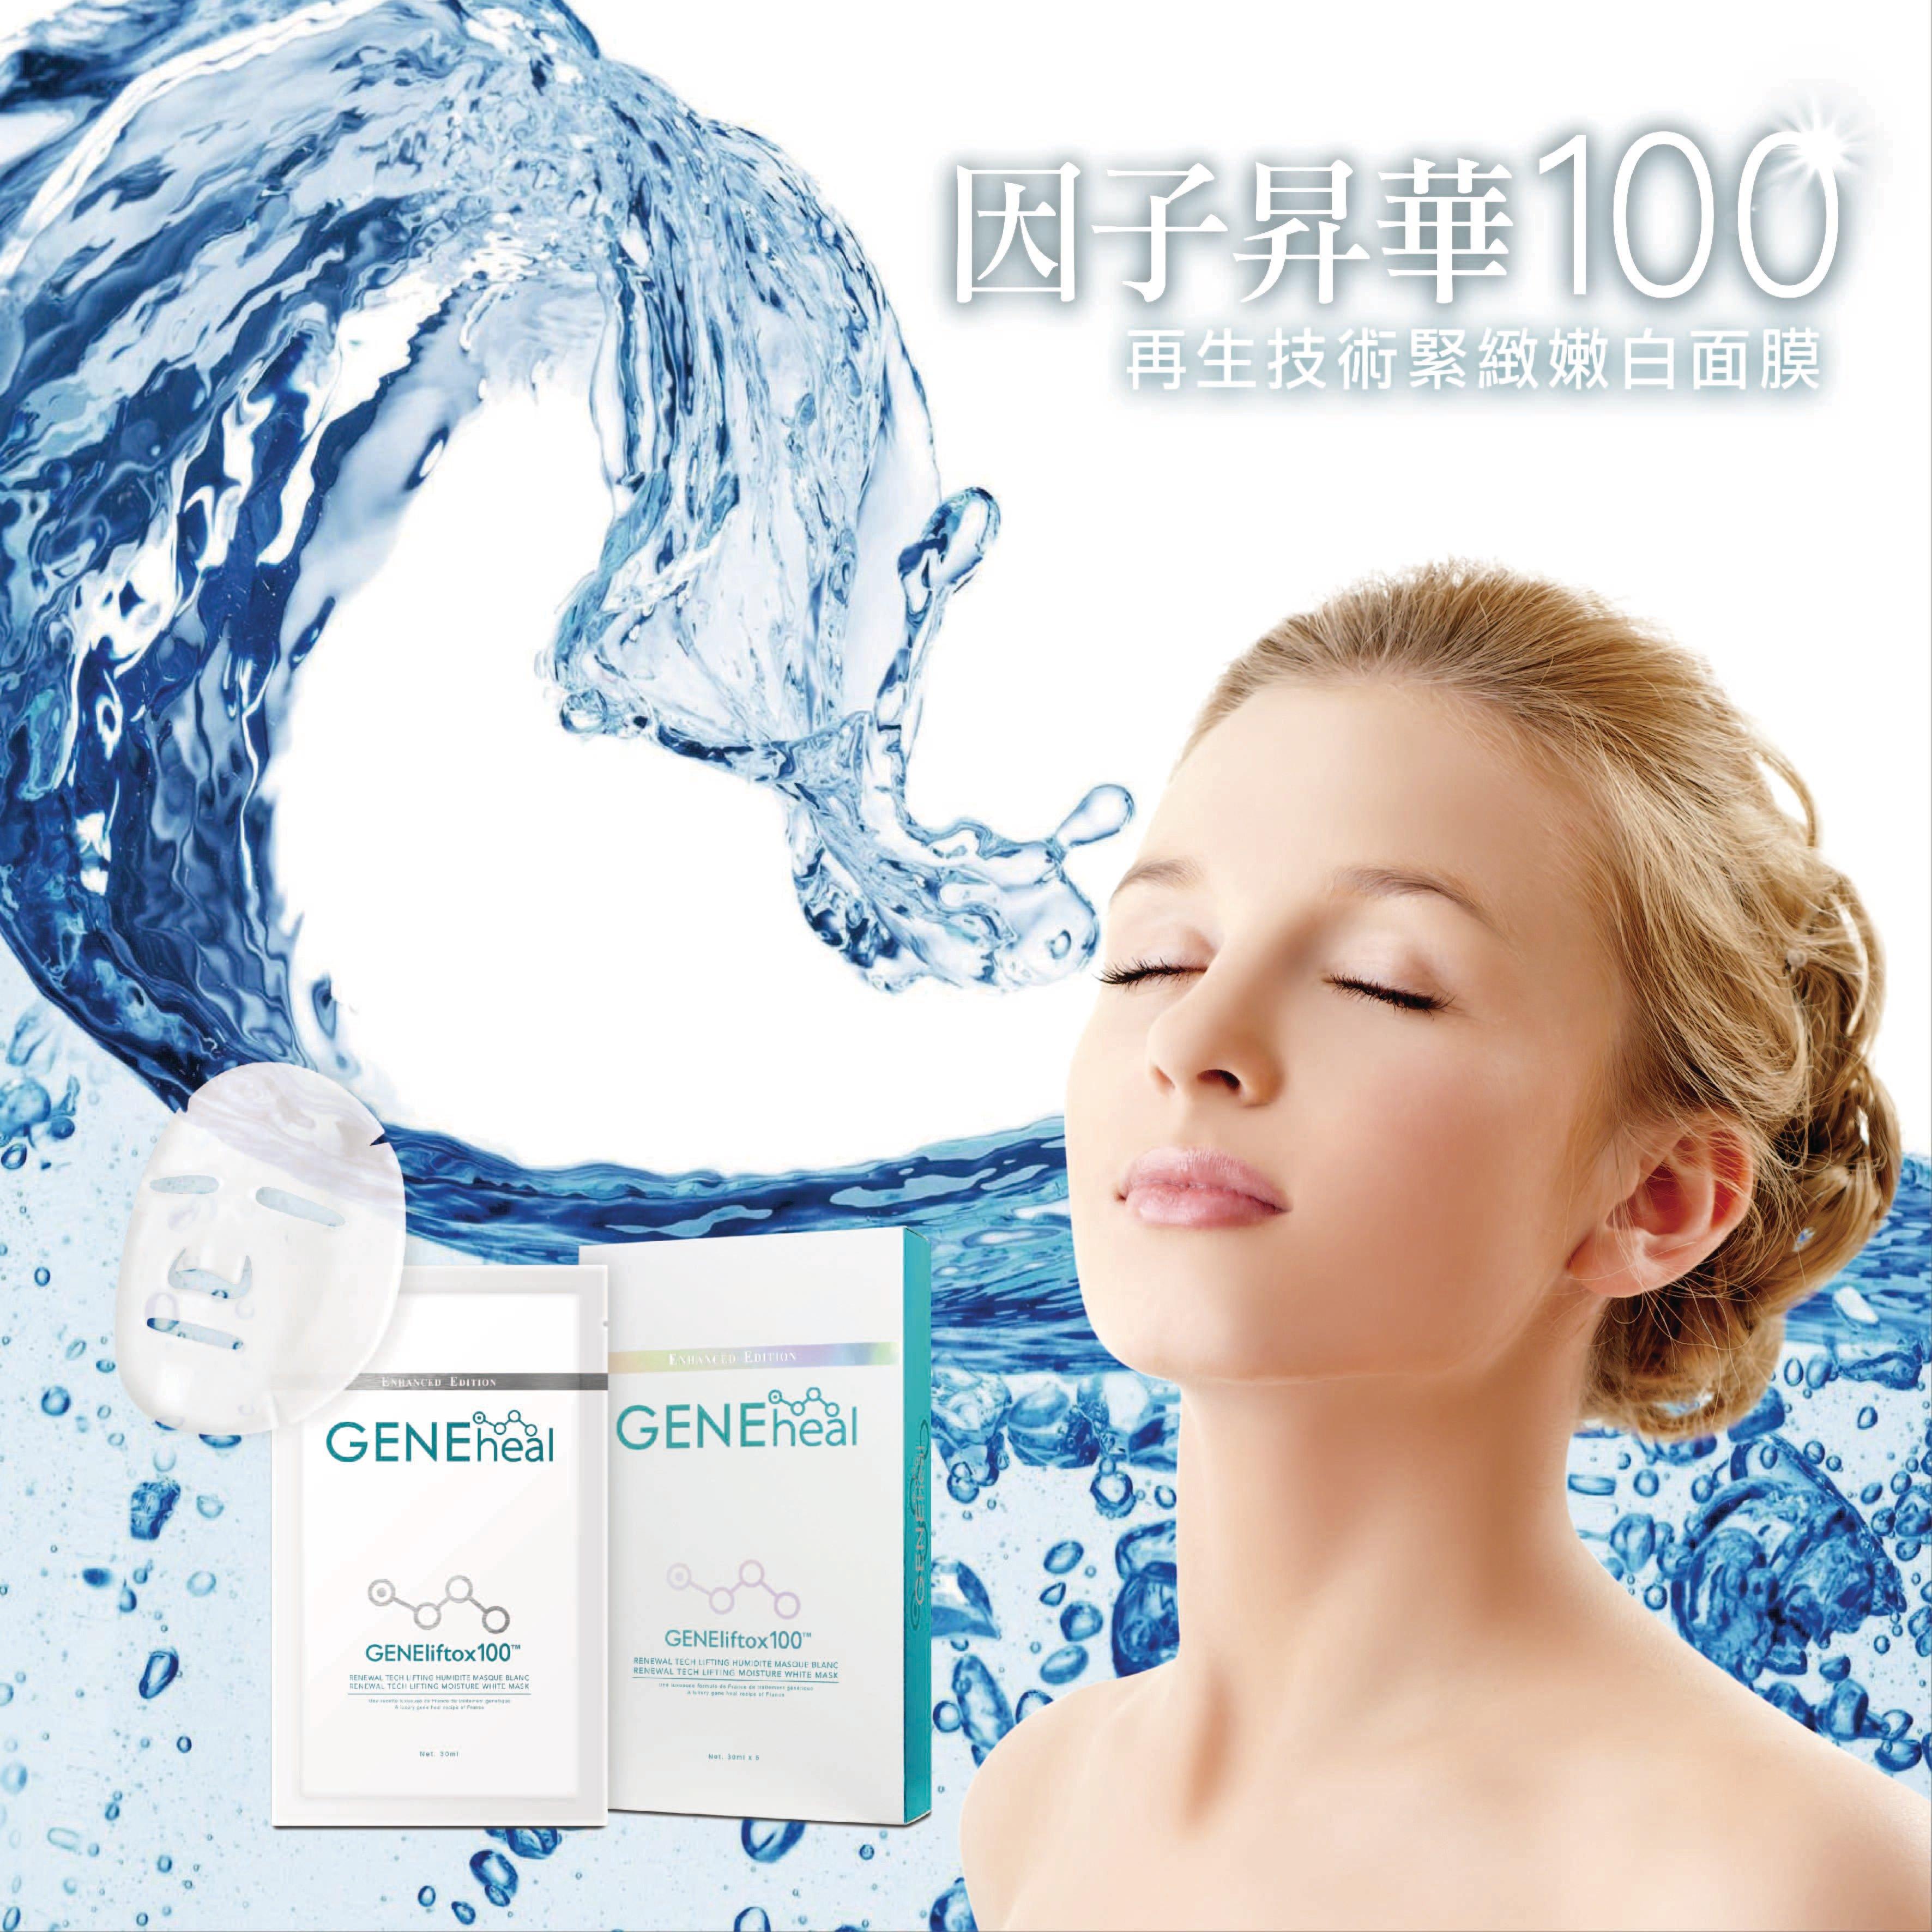 GENEliftox100 -再生科技緊緻潤白面膜